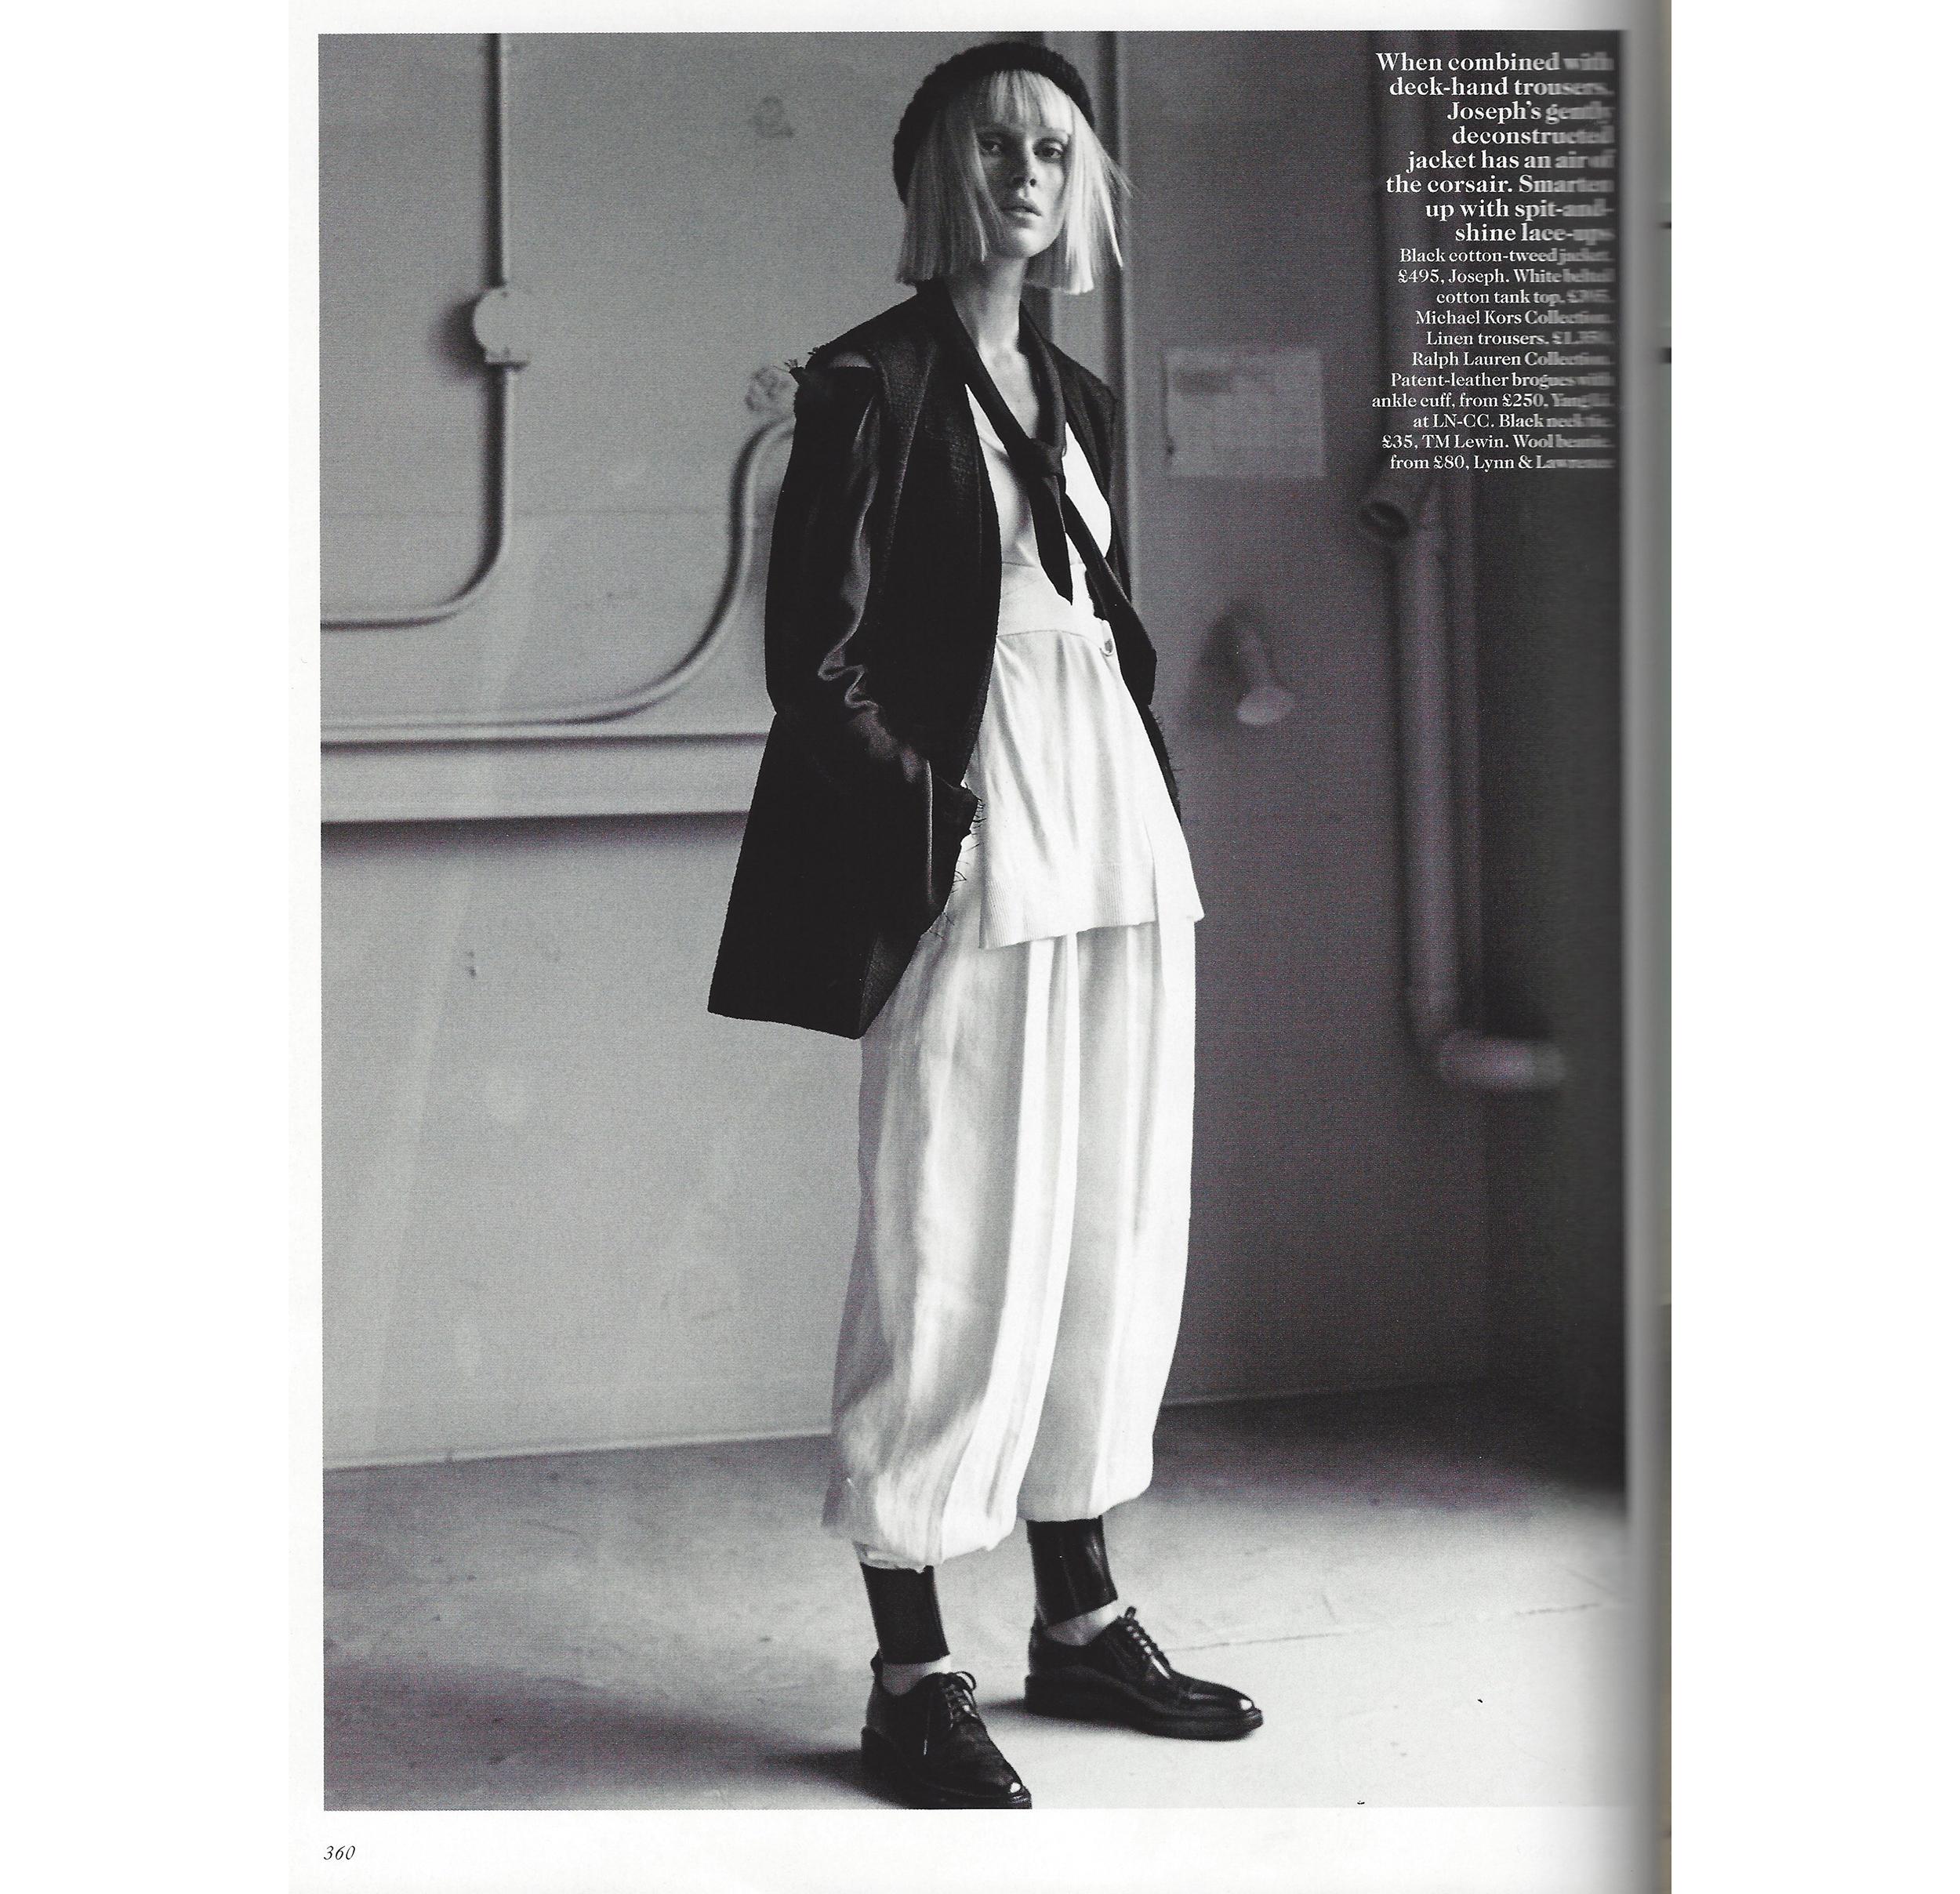 UK Vogue/ Josh Olins / Claire Richardson / Feb2016